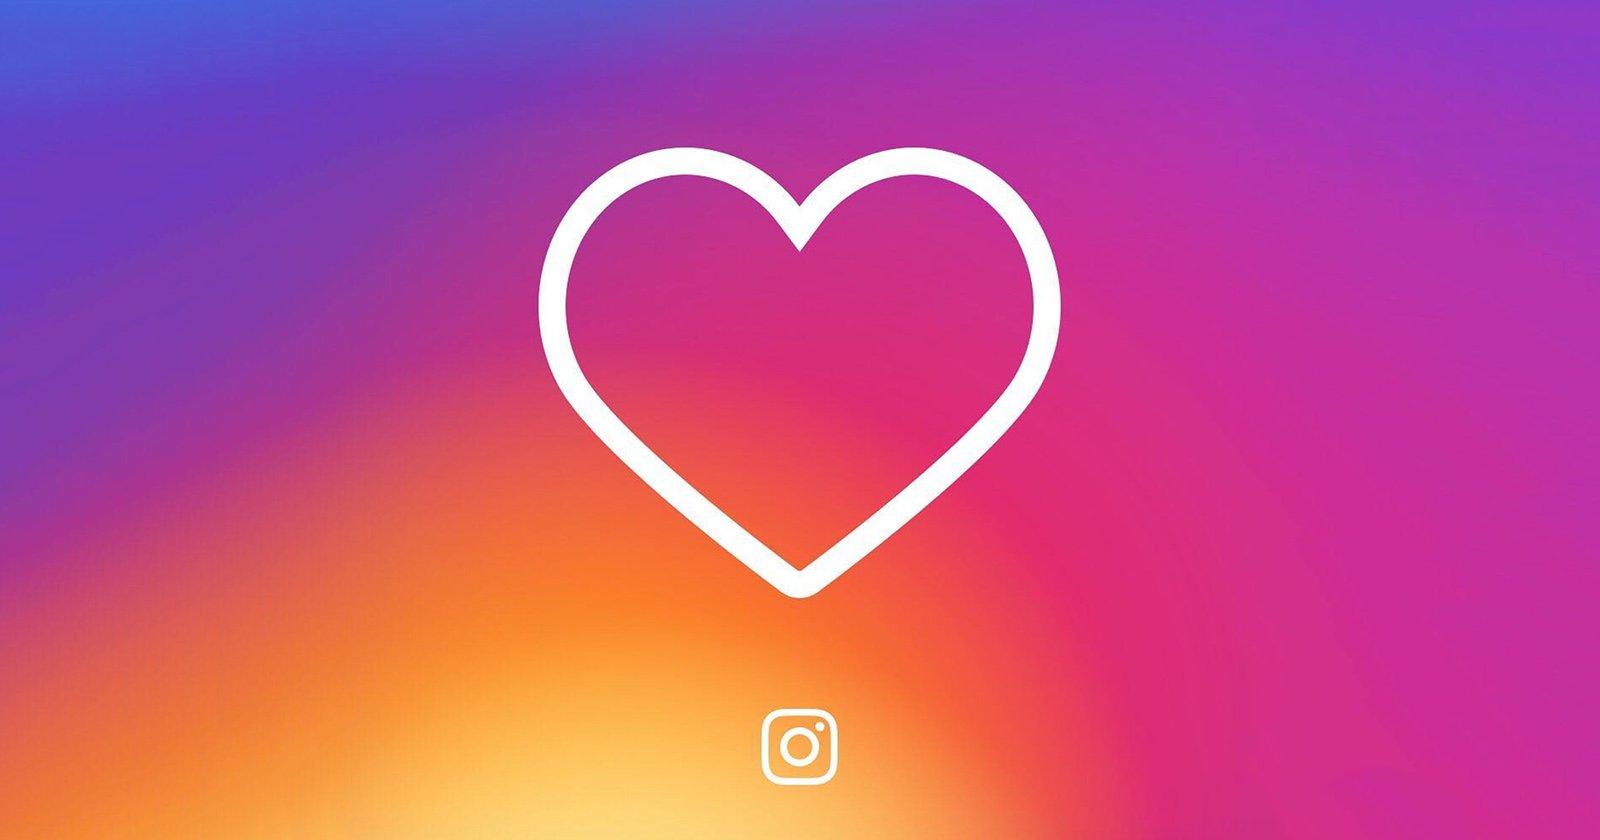 Instagram Will Soon Blur